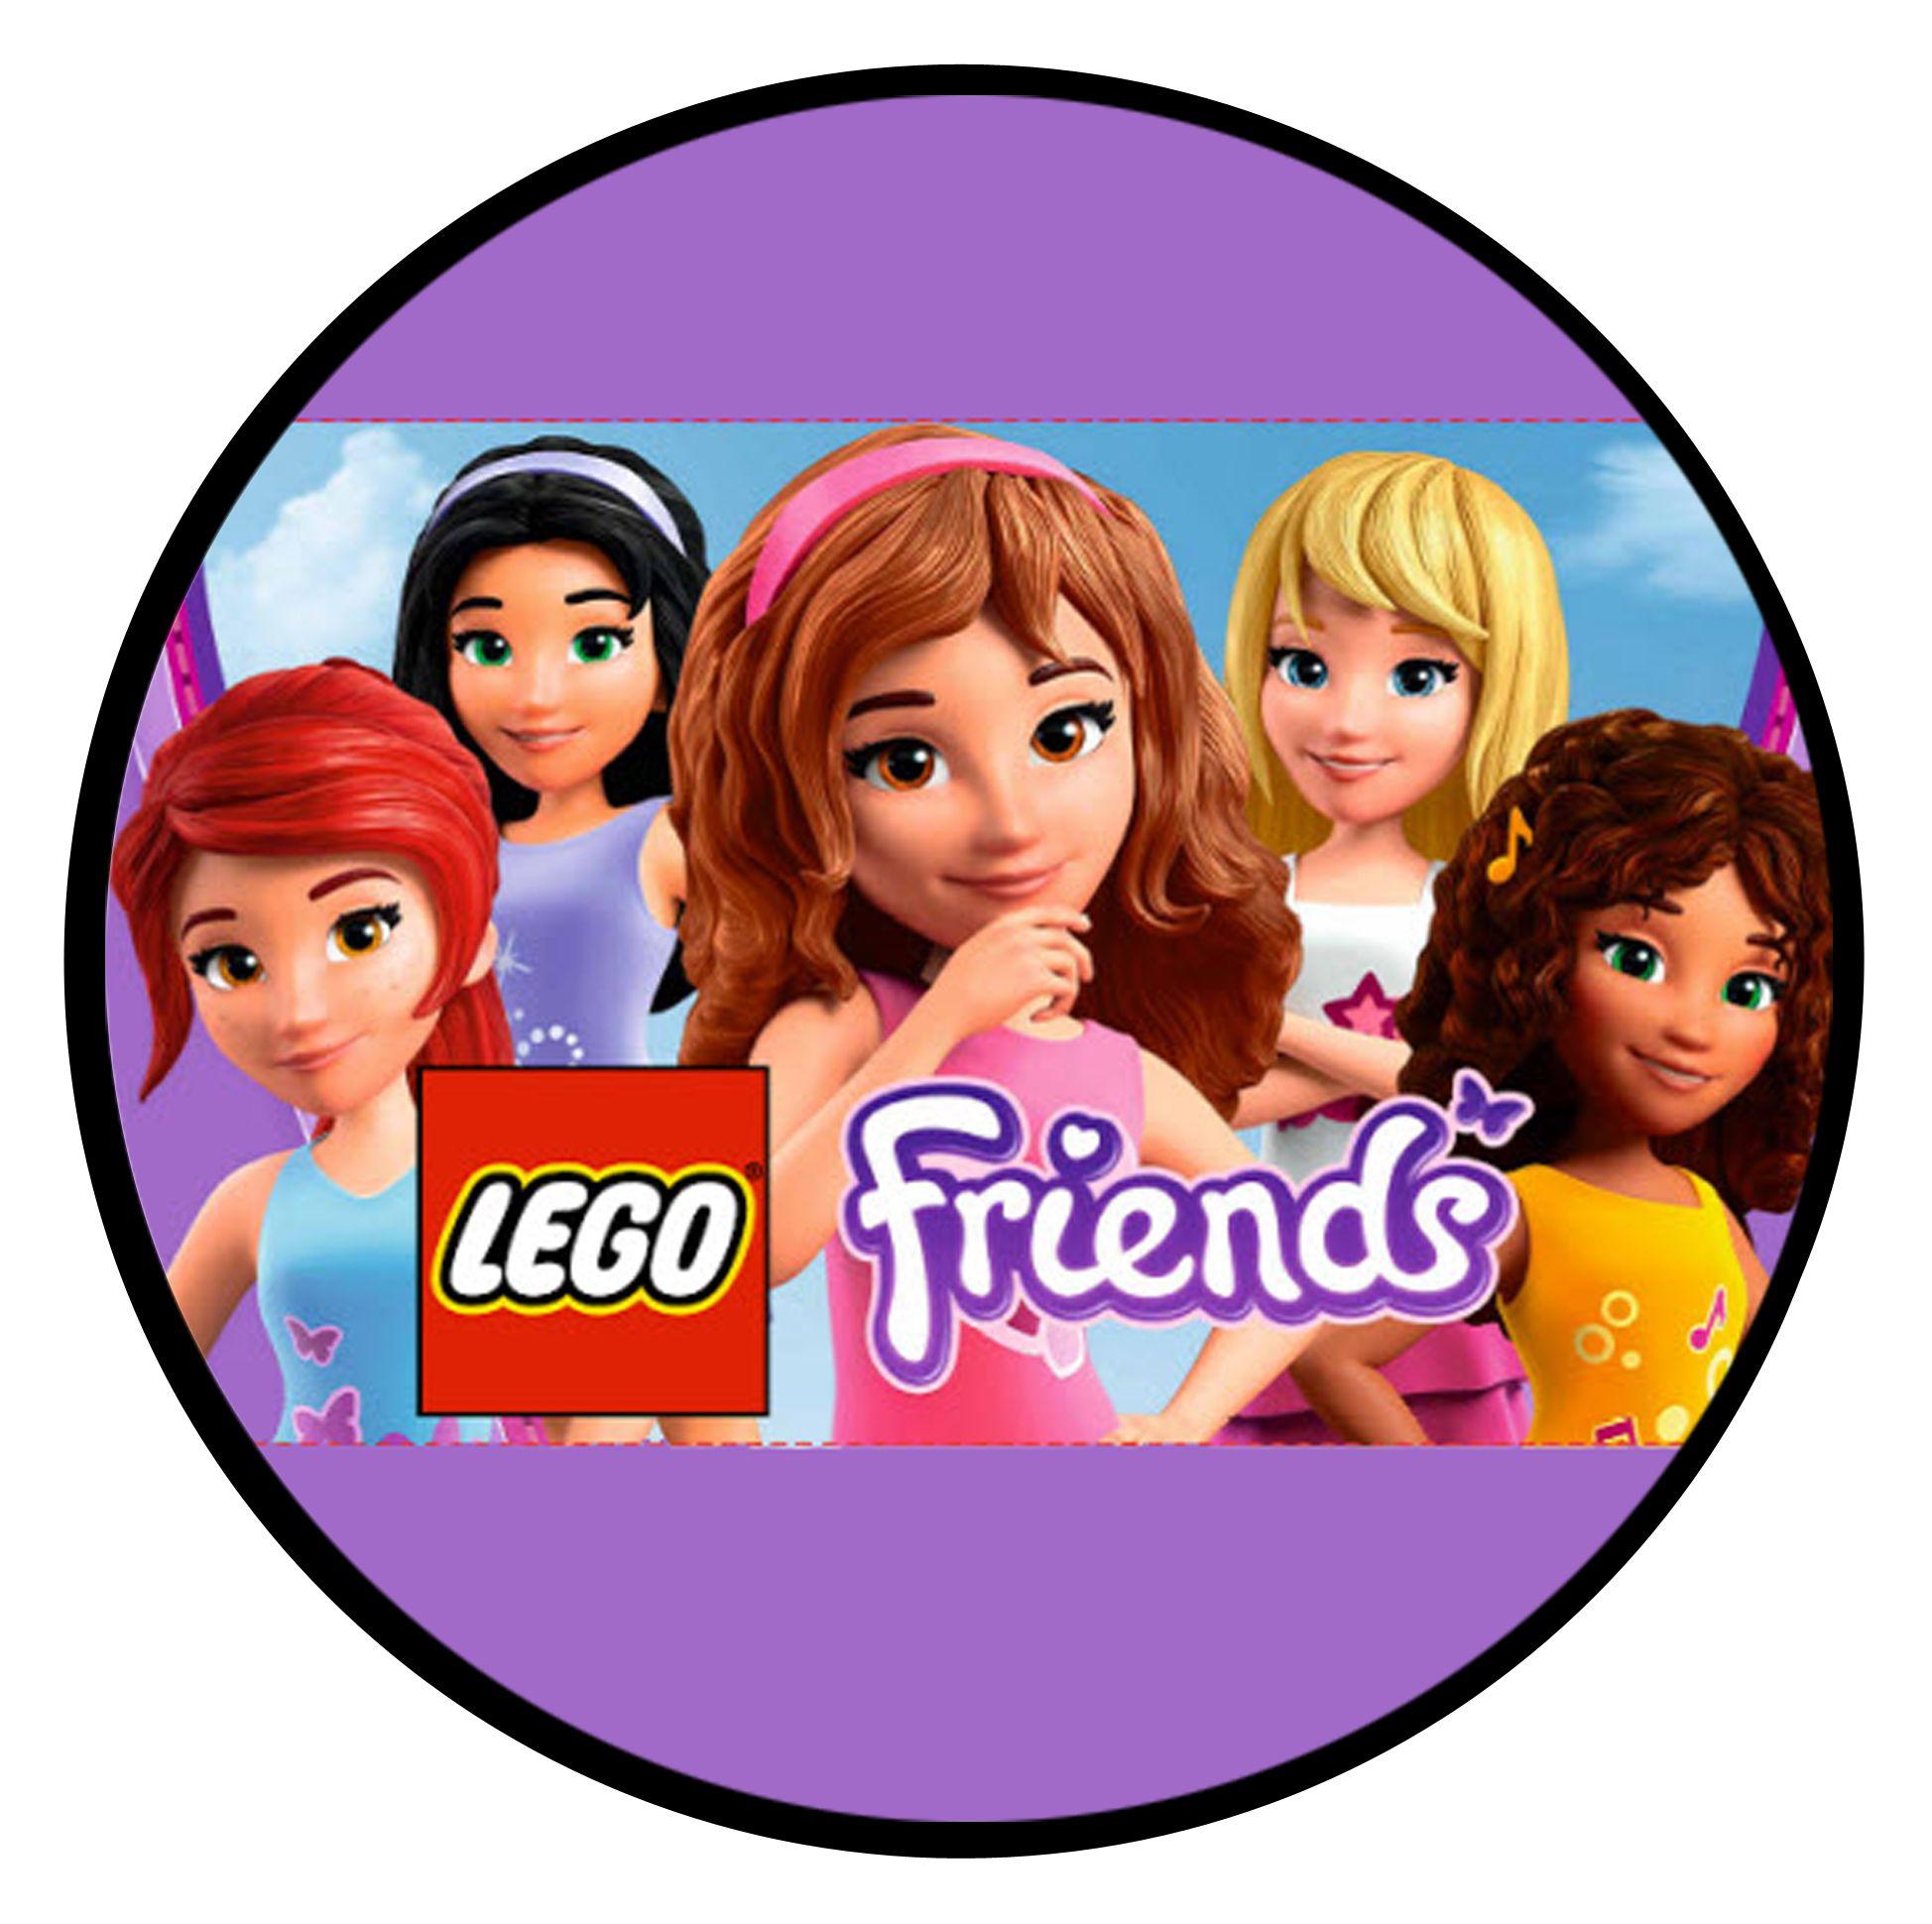 Lego Friends Logo Google Search Lego Friends Lego Friends